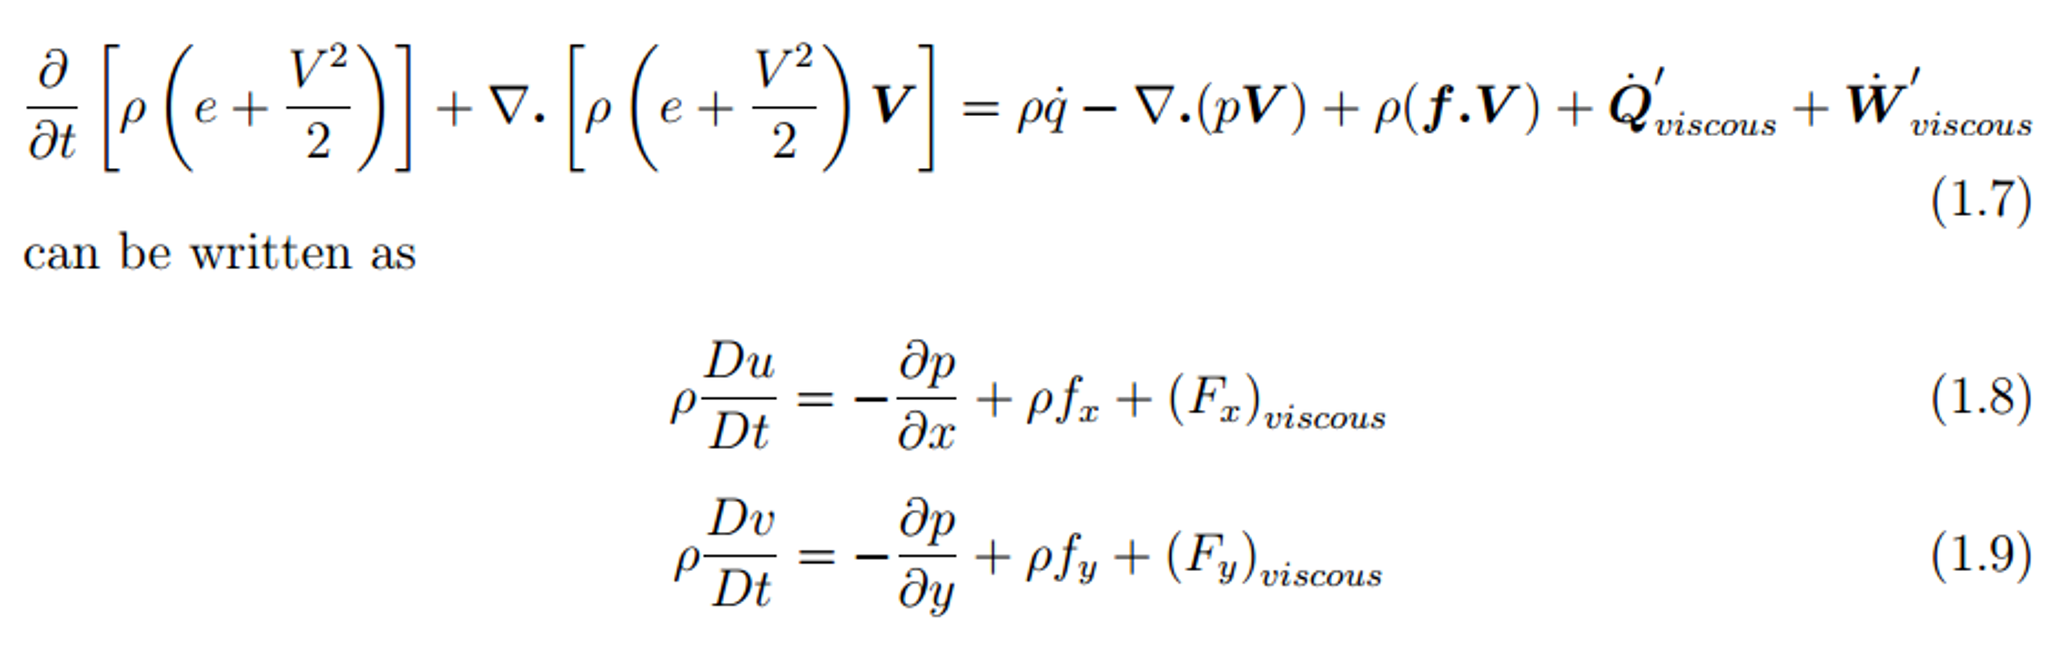 Fluid Dynamics, Conservation Of Mass, Conservation